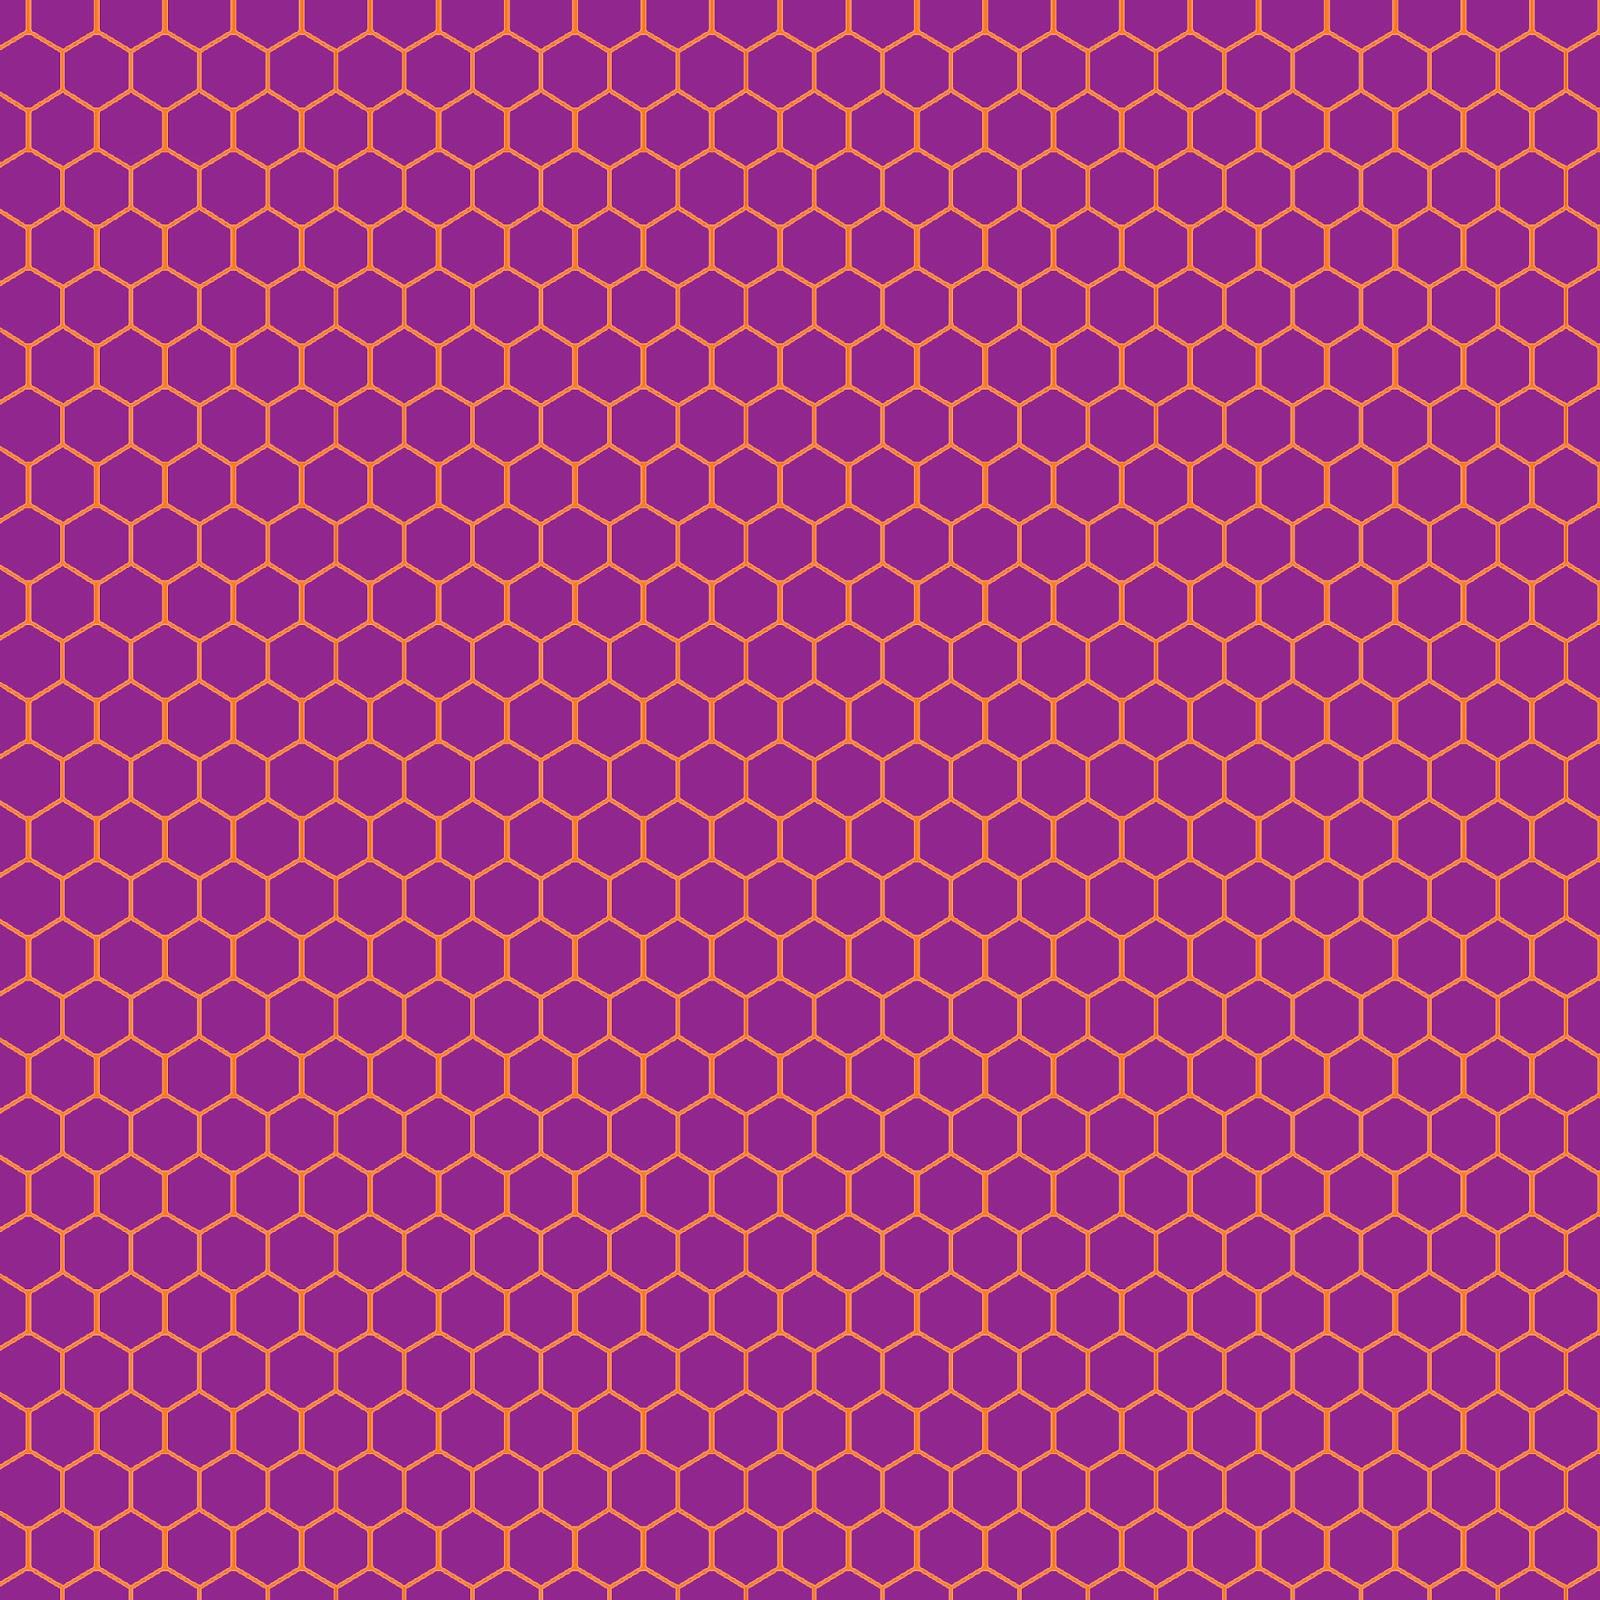 Purple Hexagon Honeycomb Freebie Pattern  Art PPT Backgrounds